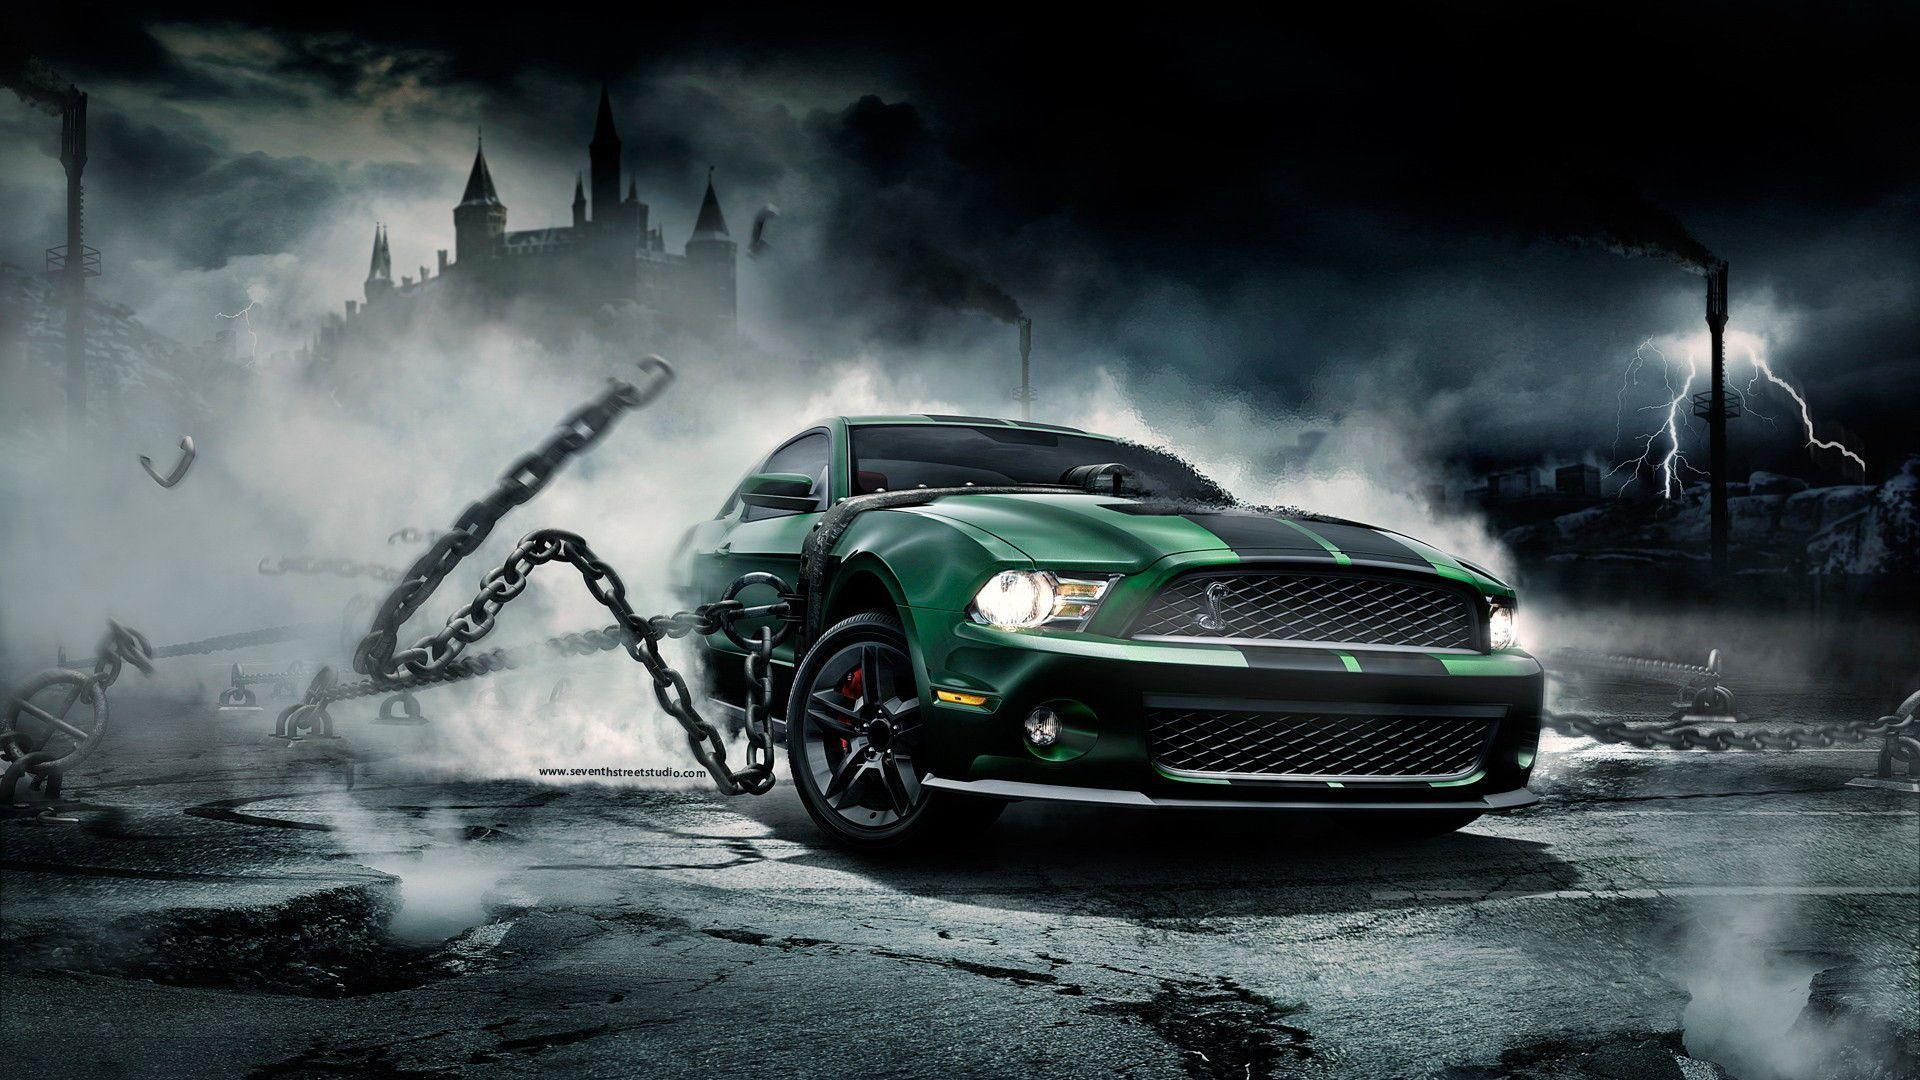 446 Mustang Wallpapers | Mustang Backgrounds